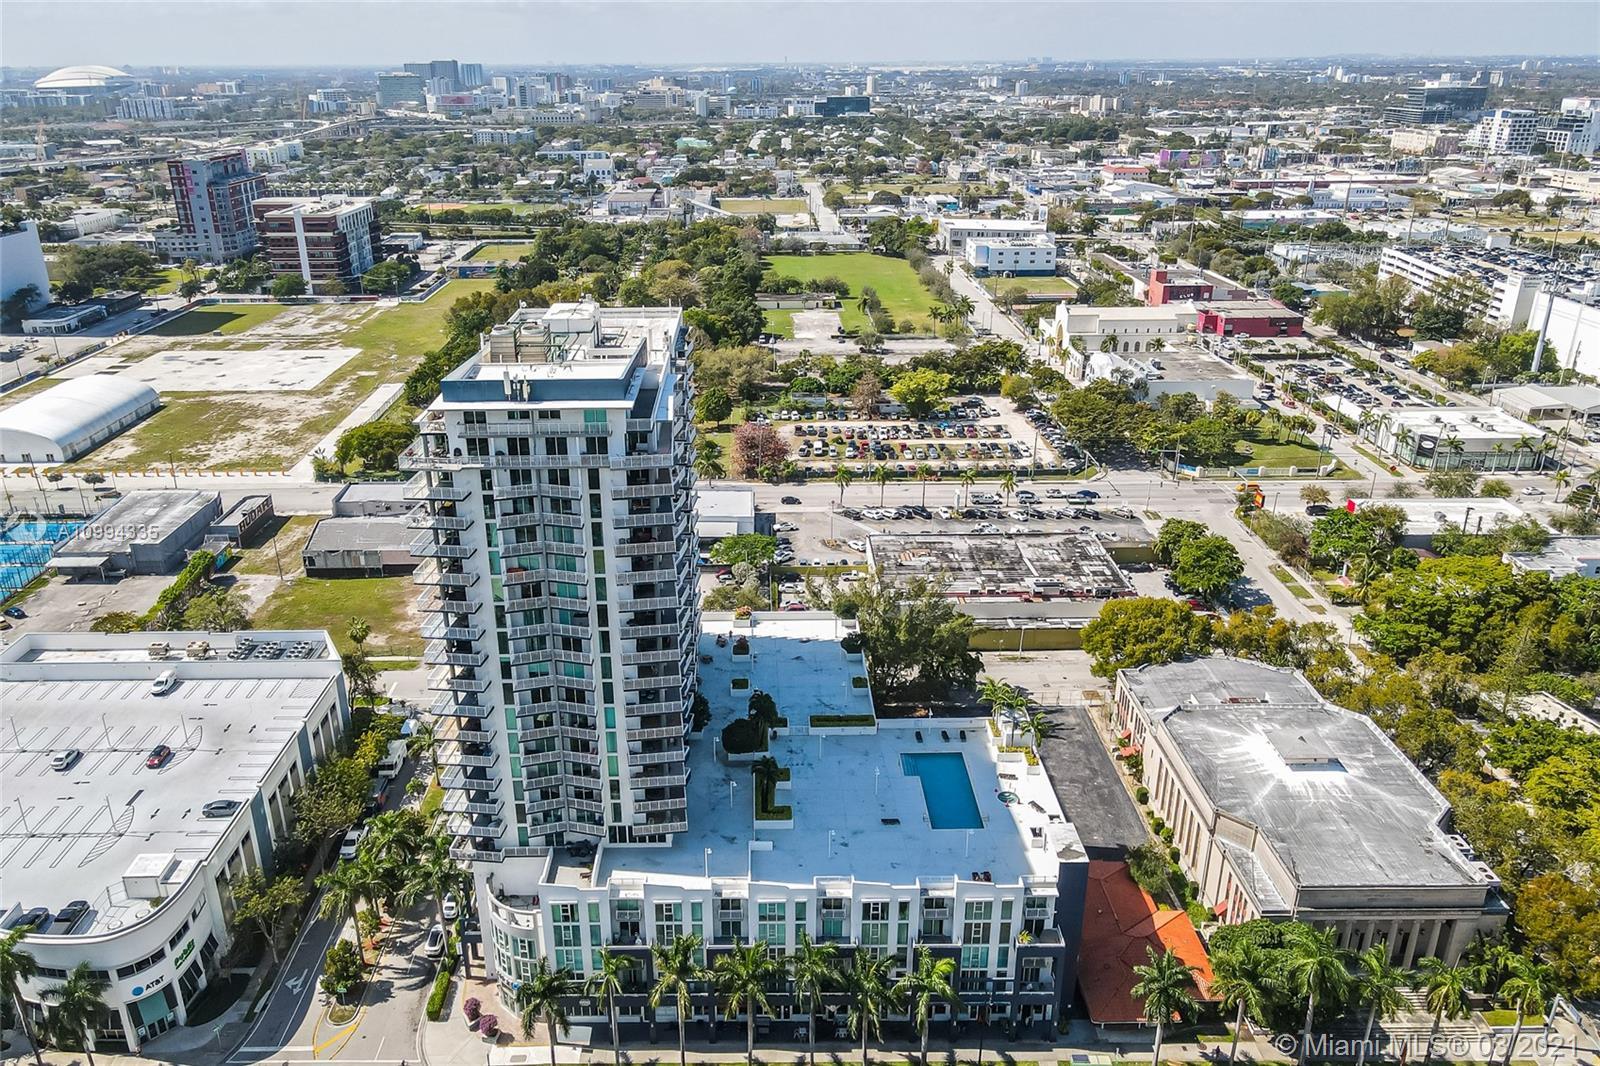 1800 Biscayne Plaza #PH09 - 06 - photo